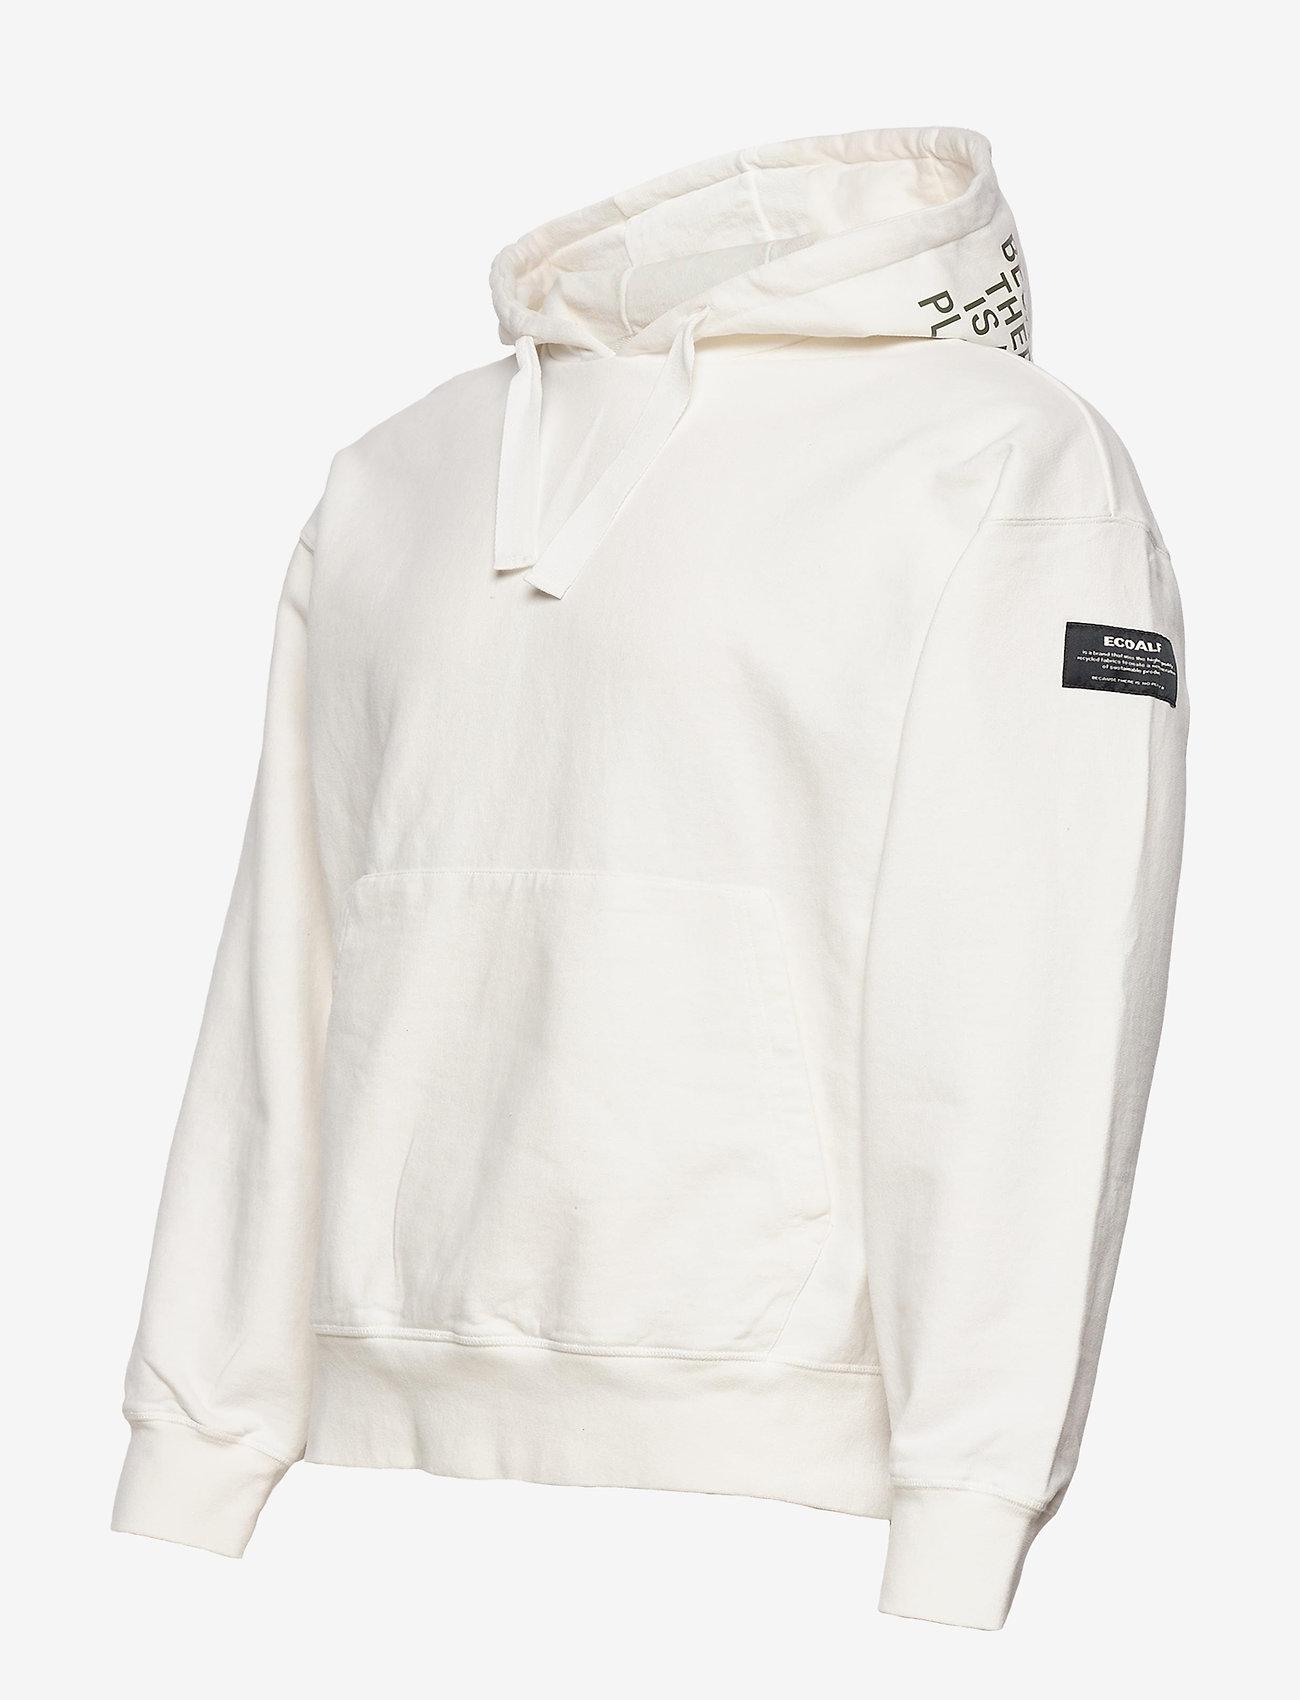 ECOALF - LUCCA SWEATSHIRT MAN - hoodies - off white - 2